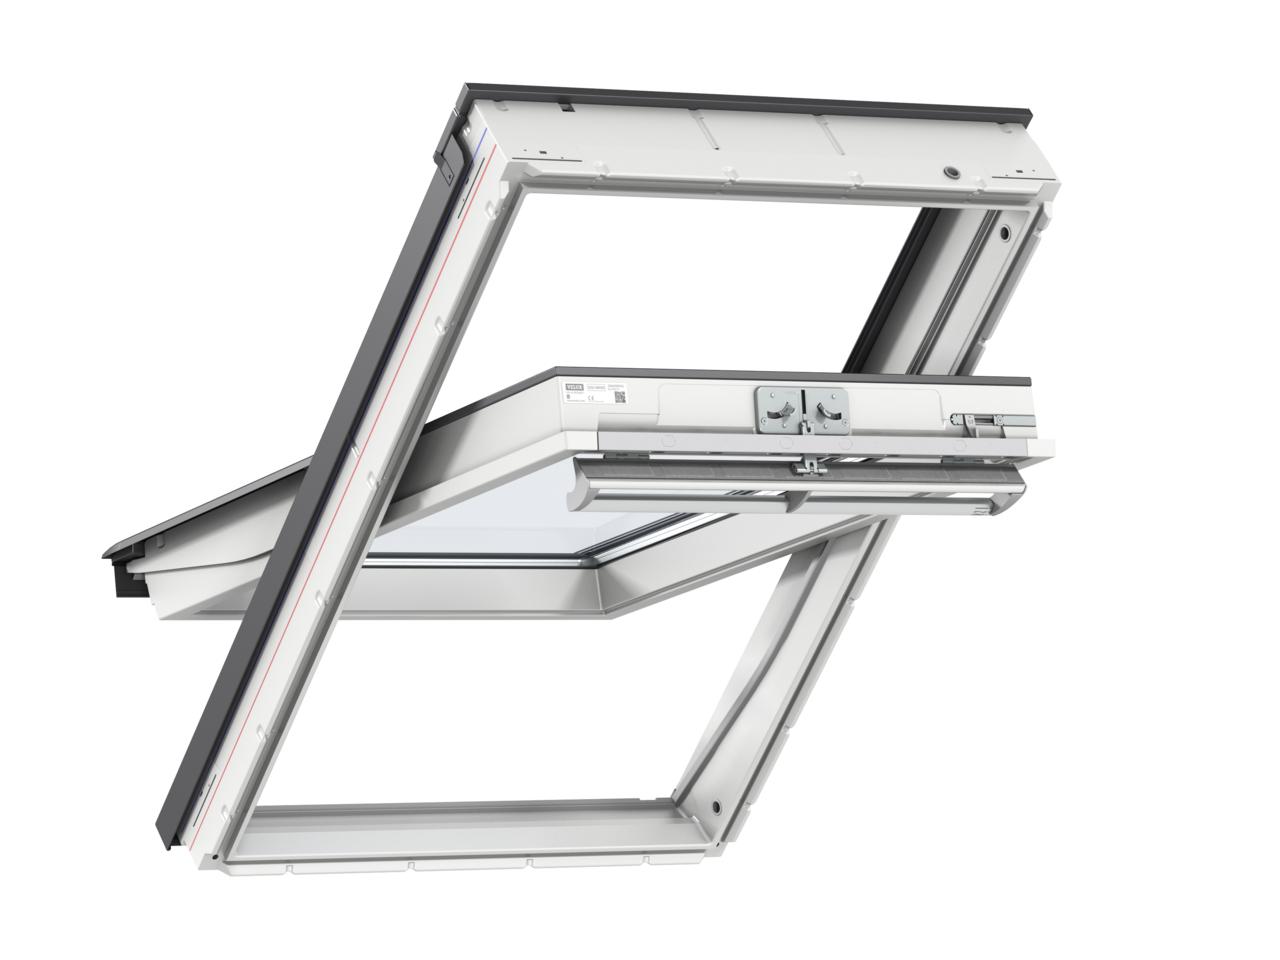 Velux GGU CK02 550 x 780mm Centre Pivot 34Pane Roof Window - White Polyurethane